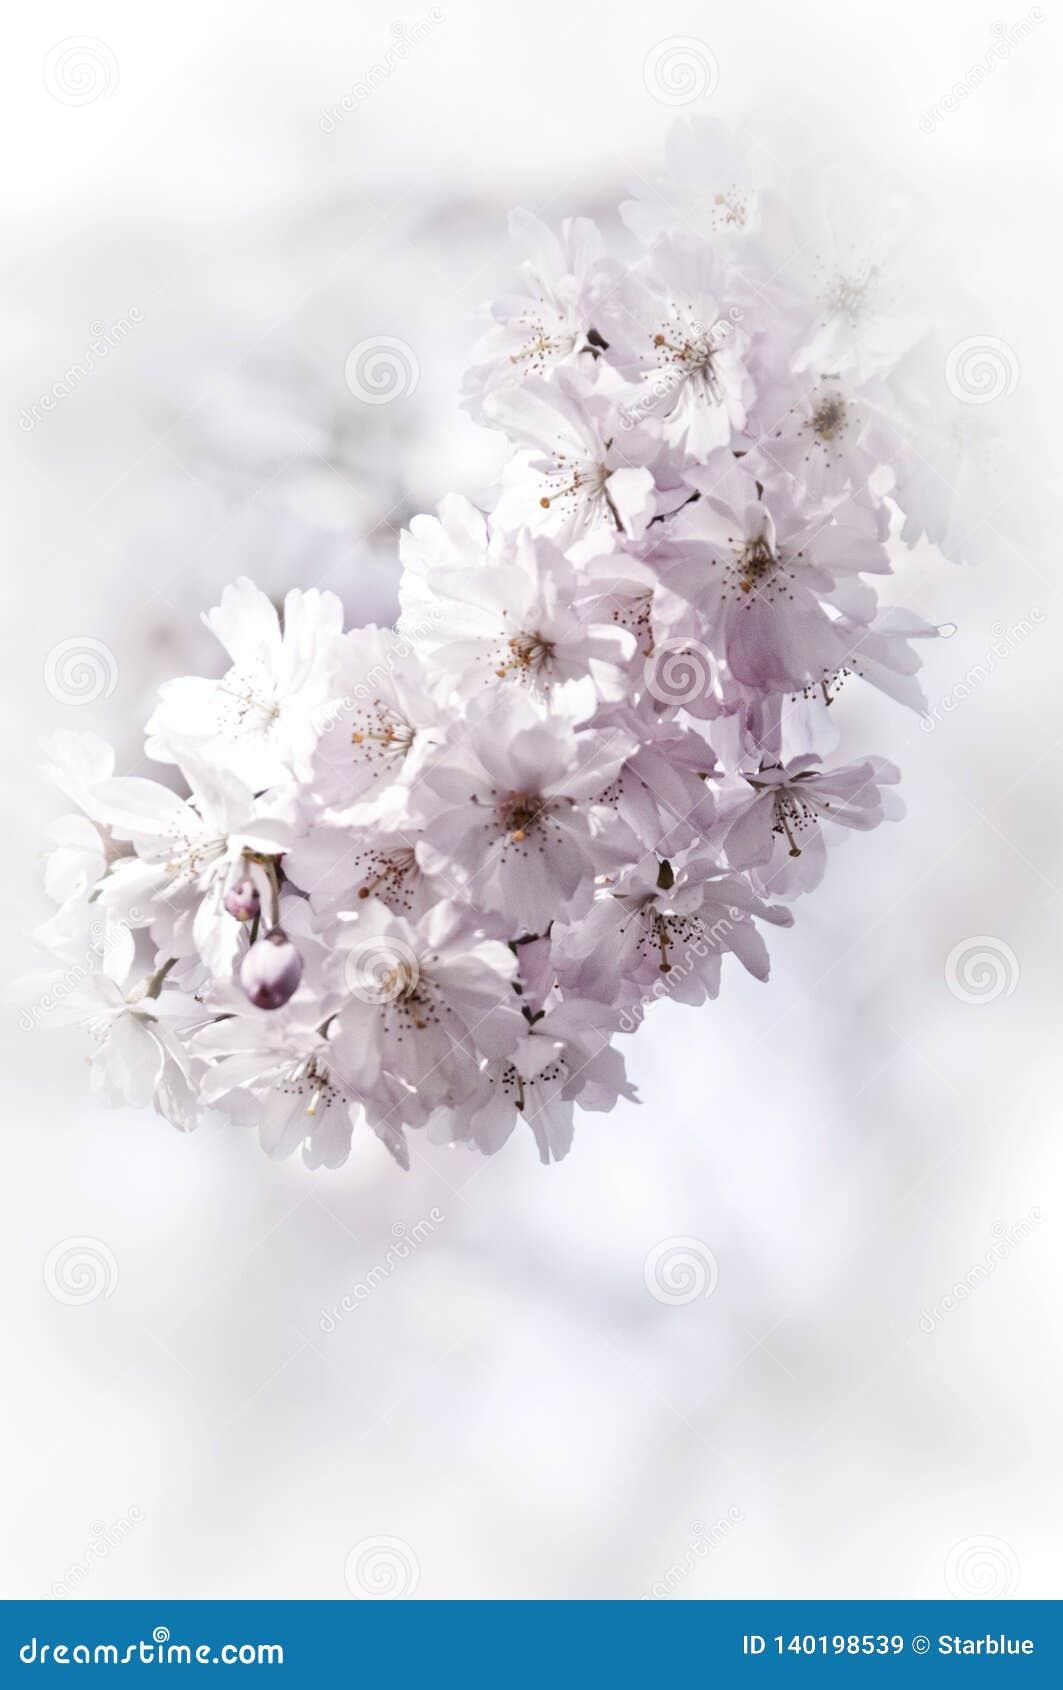 Romantic spring tree of wild cherry tree or apple tree in blooming